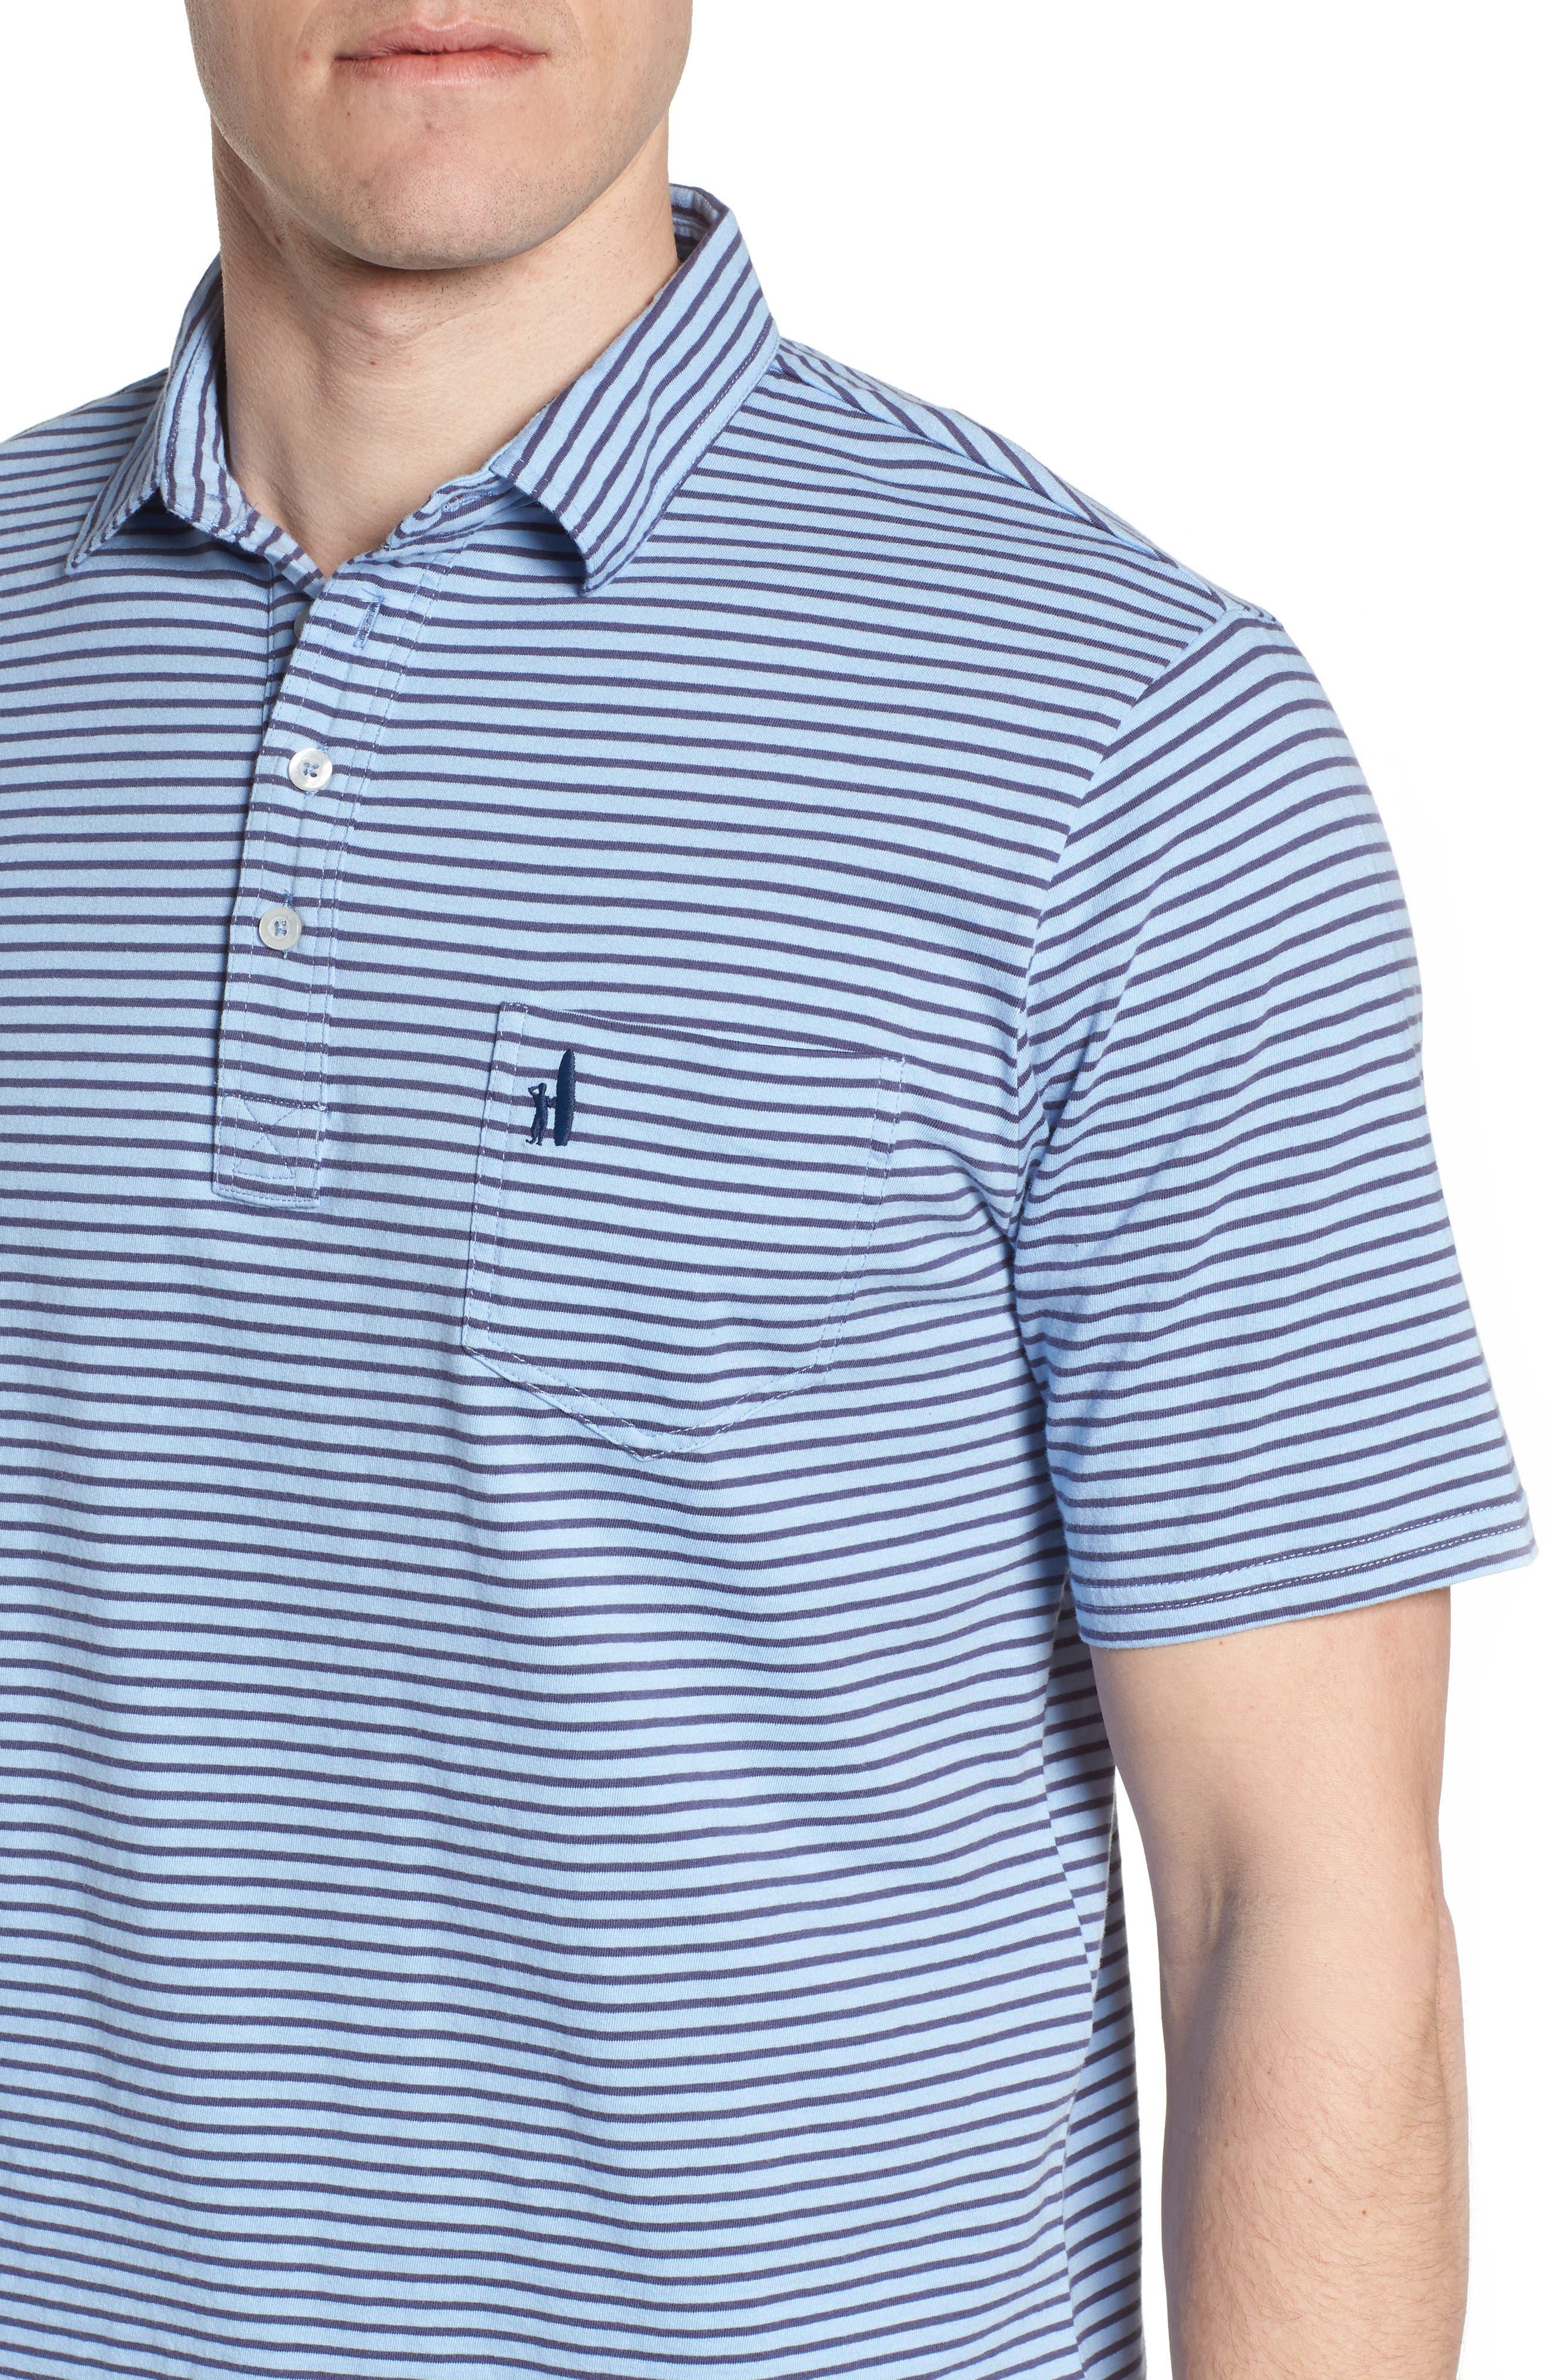 Macon Regular Fit Stripe Polo,                             Alternate thumbnail 4, color,                             Vista